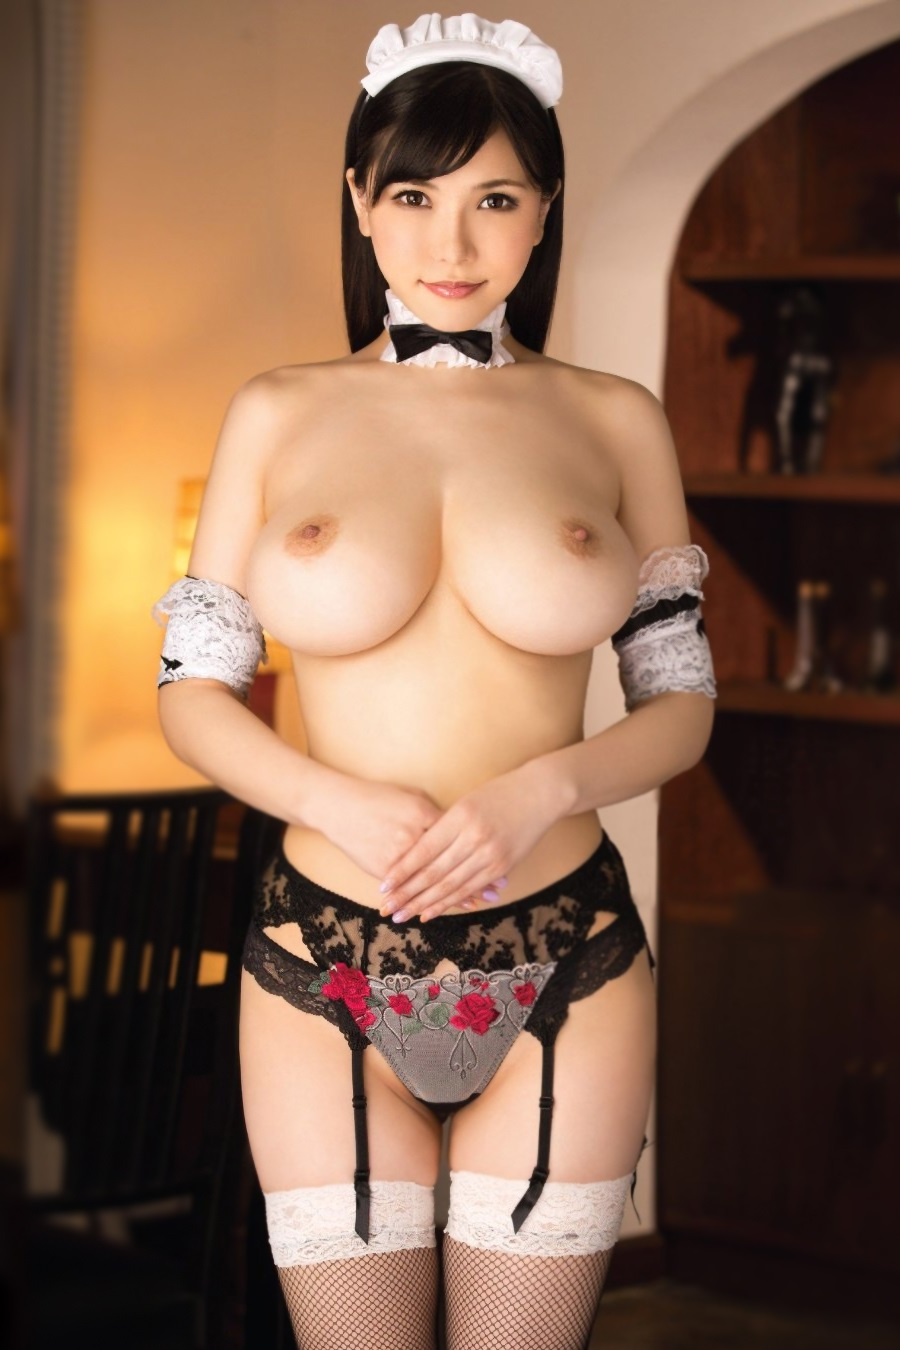 Anri okita gif street fighter cosplay tits